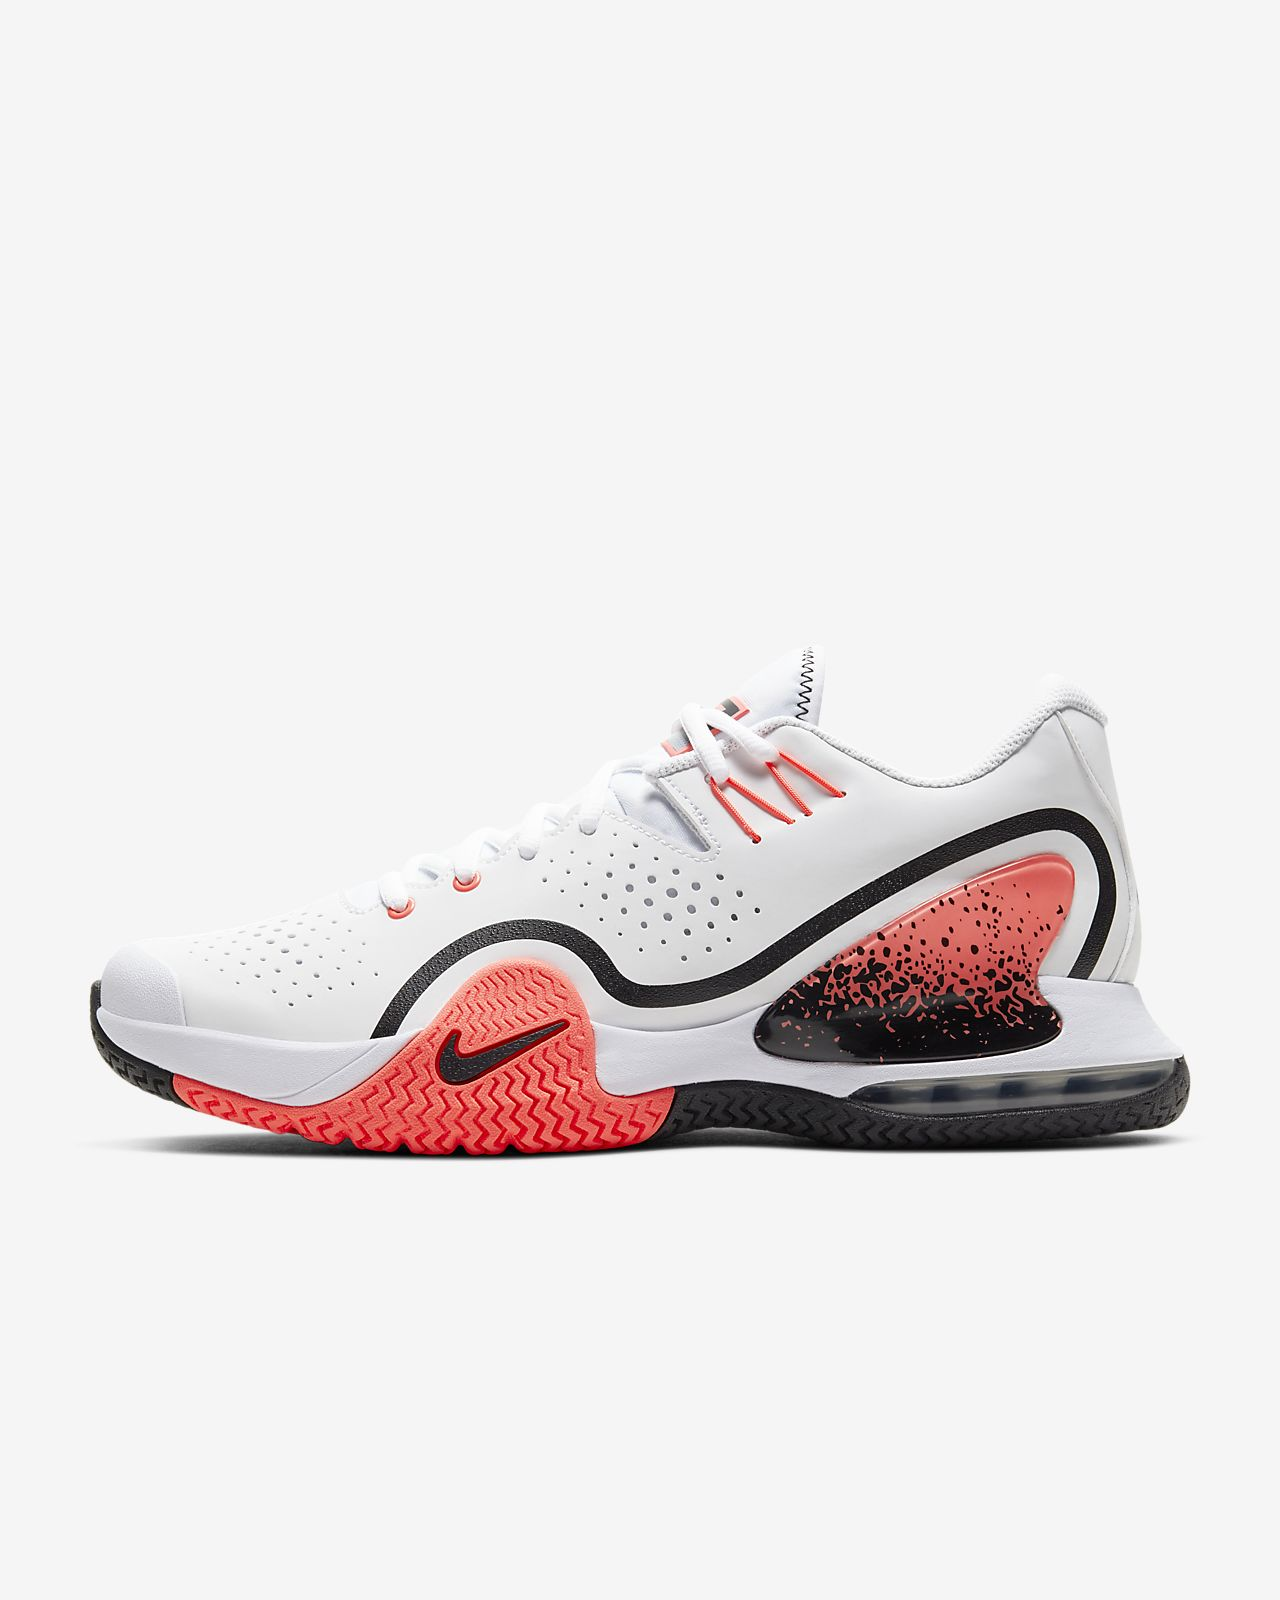 NikeCourt Tech Challenge 20 Men's Tennis Shoe